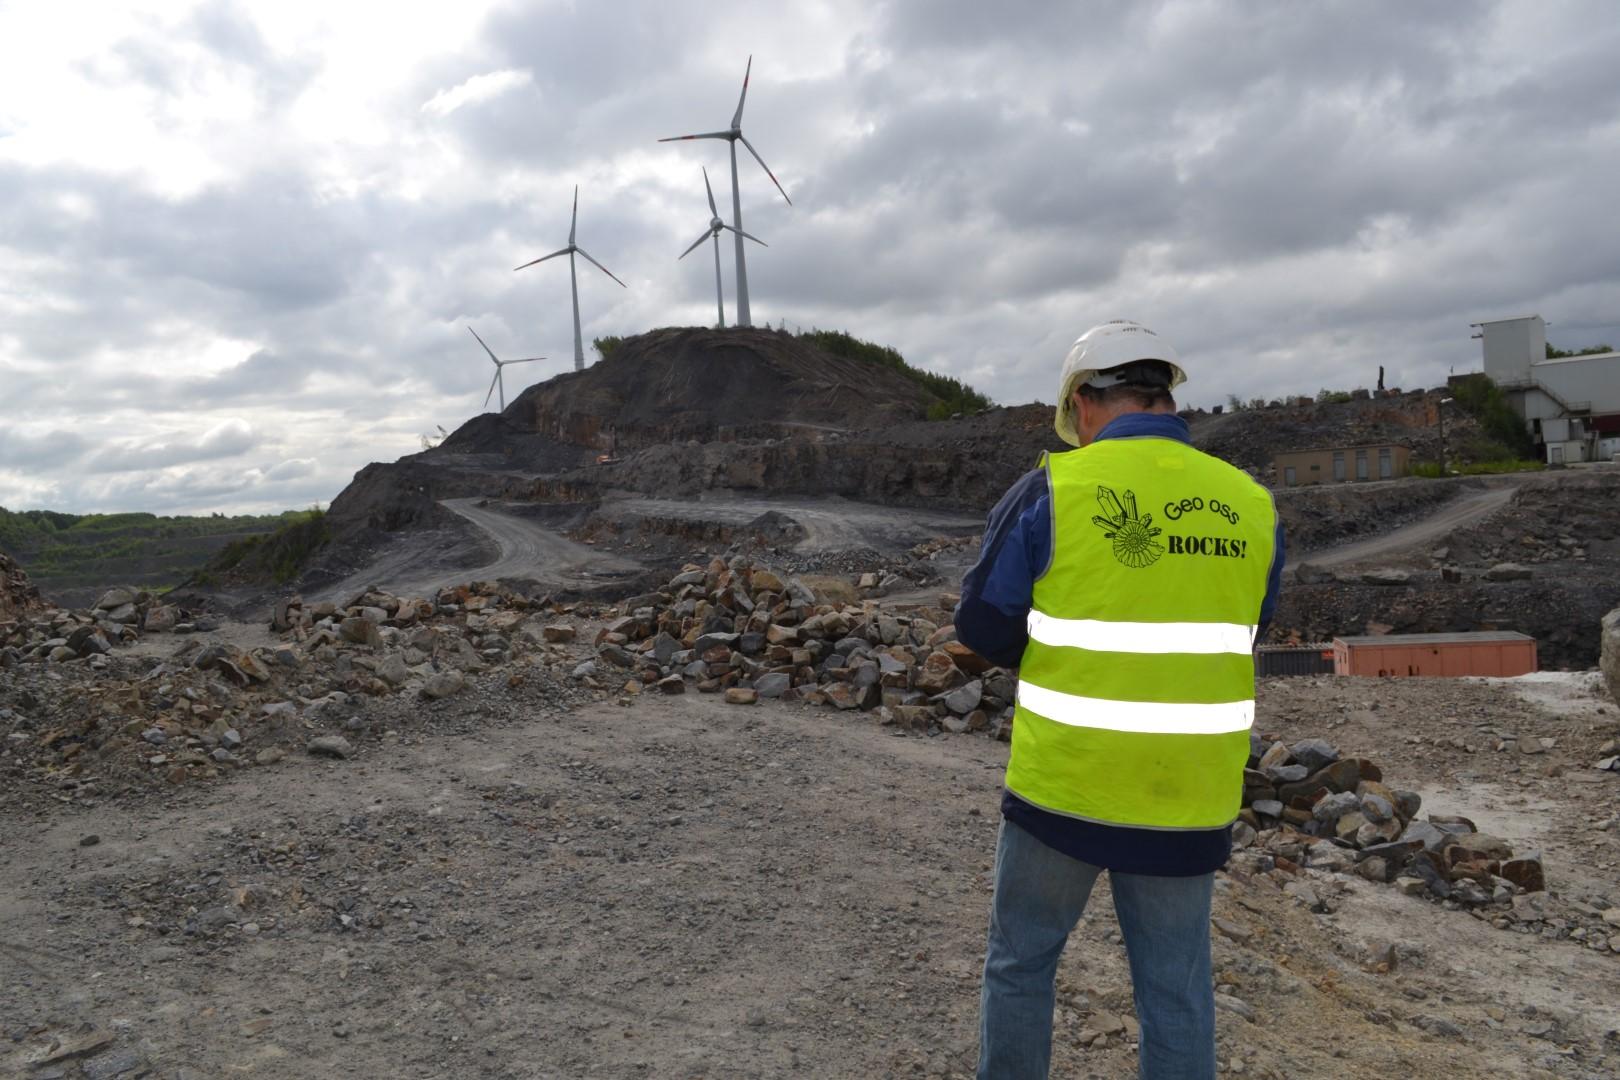 Geo Oss donateur in de groeve Piesberg te Duitsland.